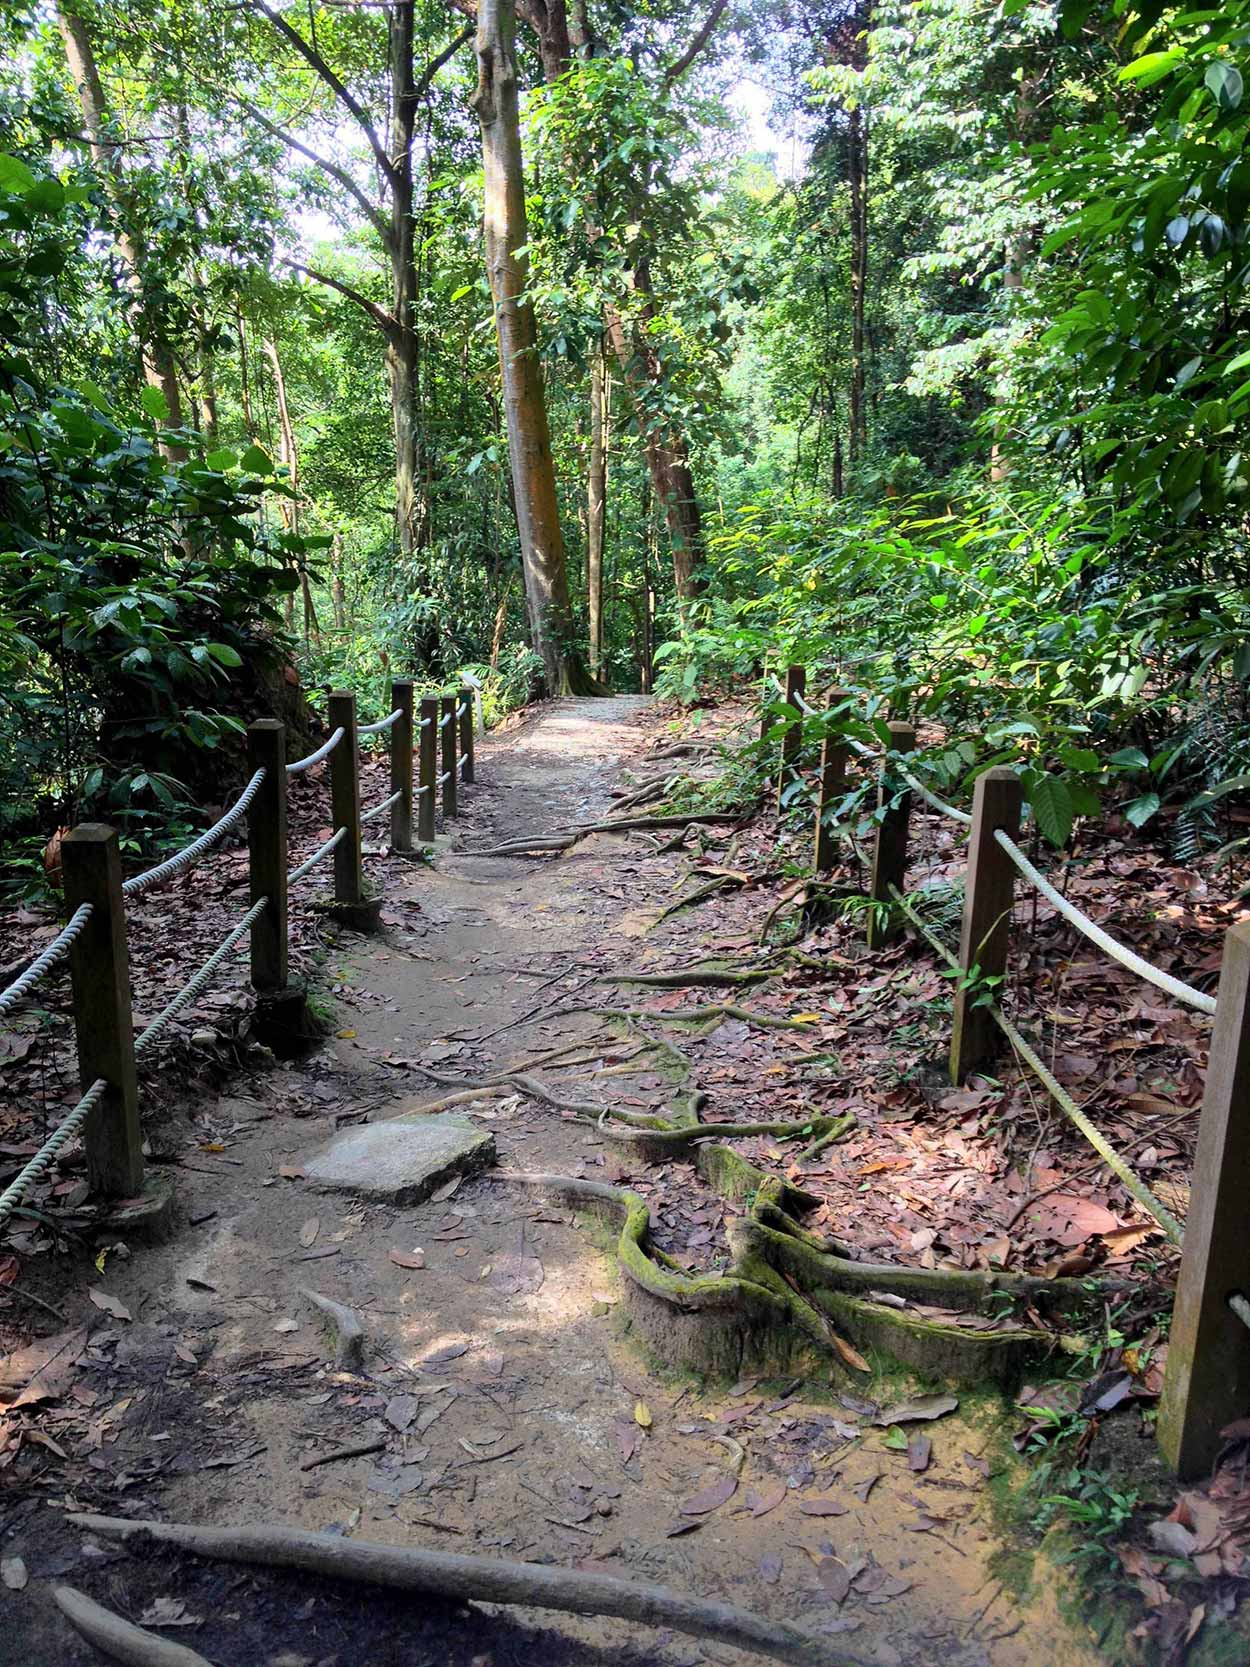 A path through the jungle, Bukit Timah, Singapore